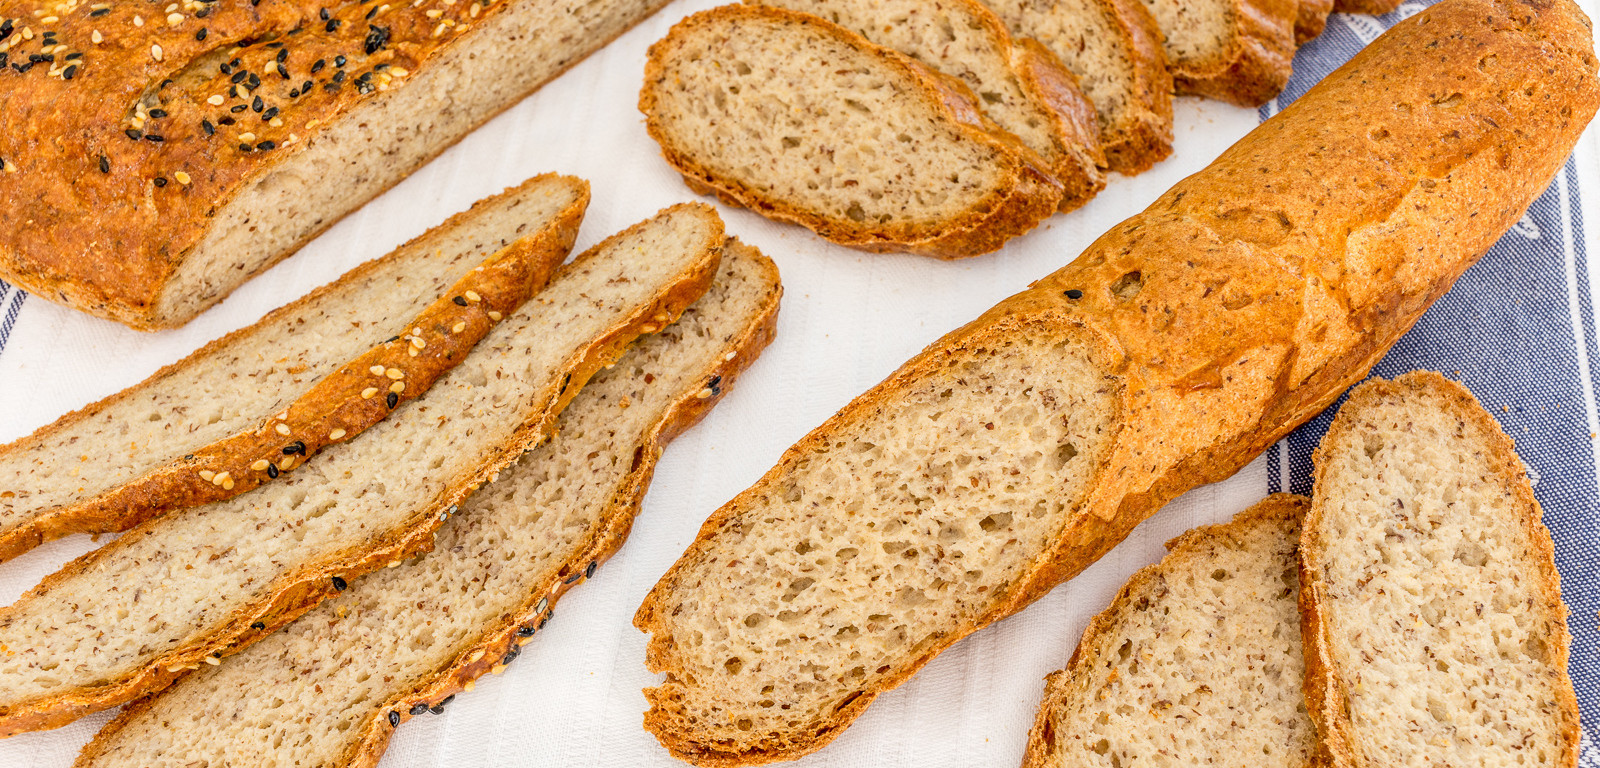 Gluten Free Bread Dough  Baking Gluten Free Bread from Soft Yeast Dough – Cooking